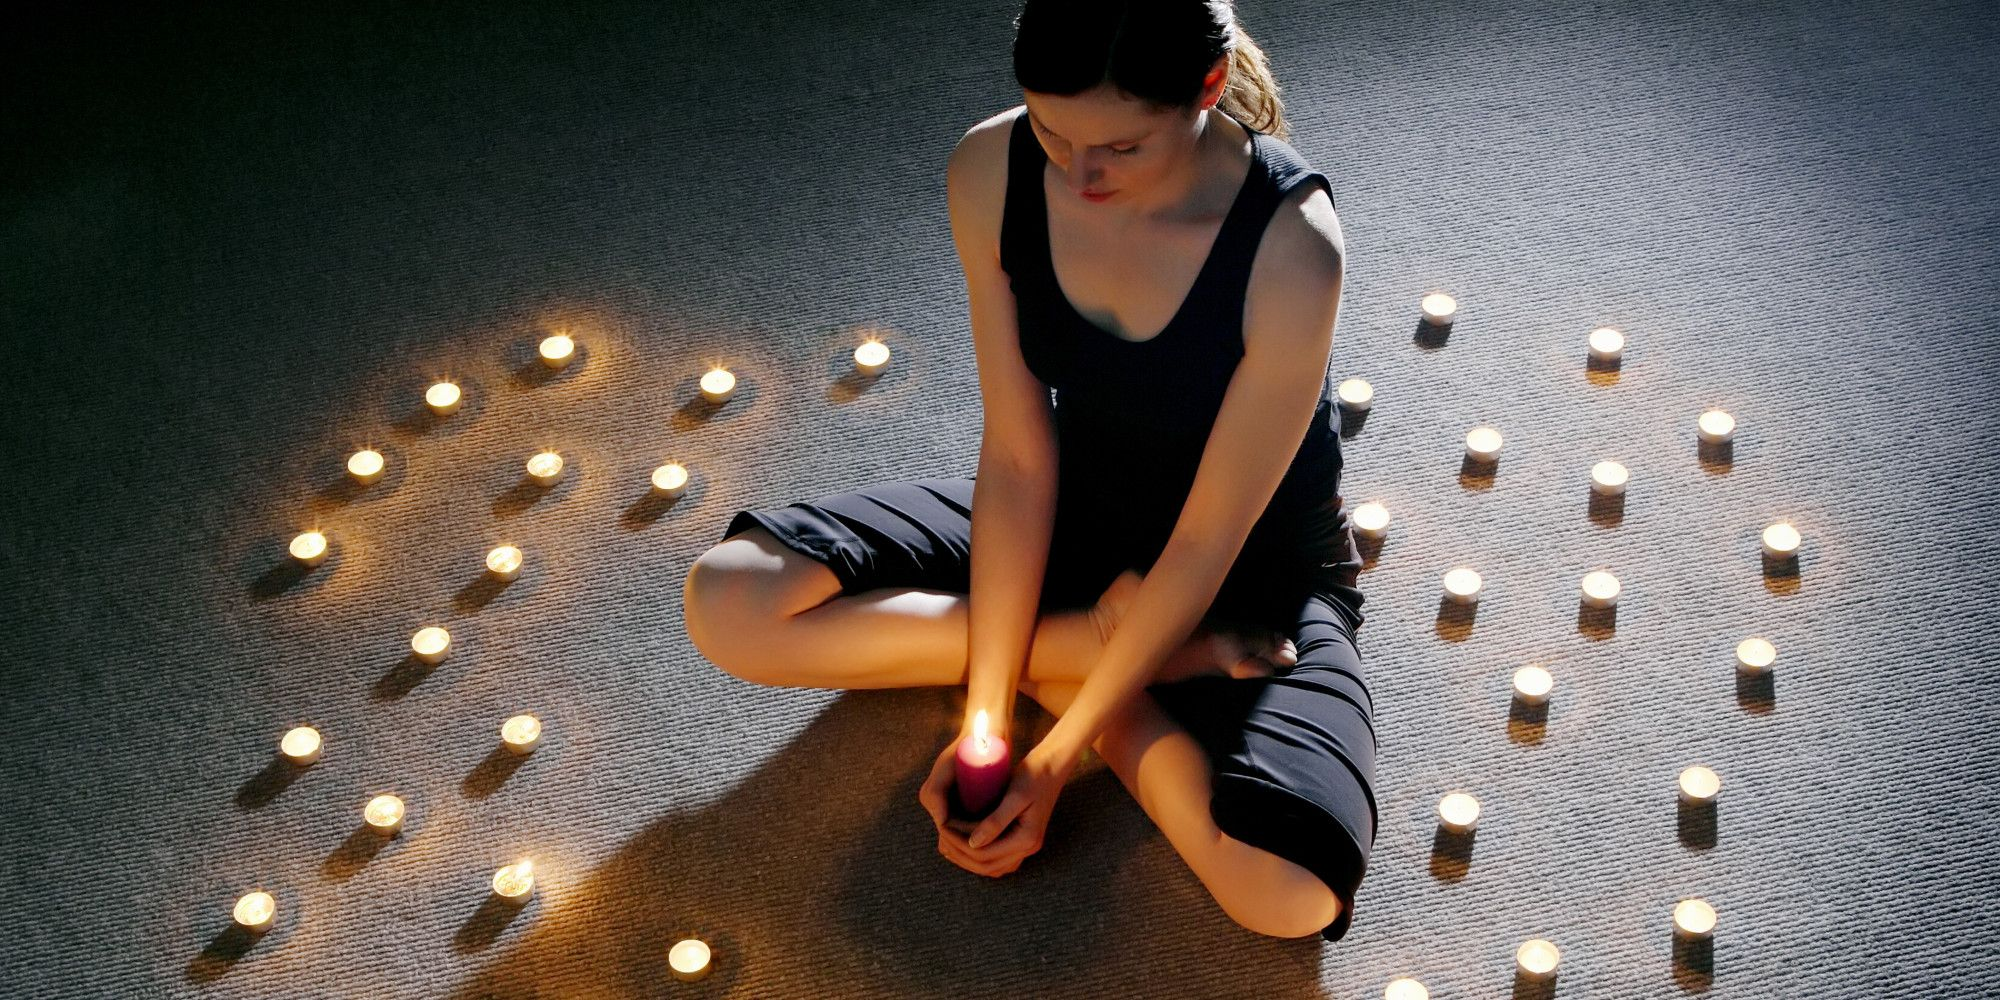 Loving-kindness Meditation (LKM) is Key to Longevity